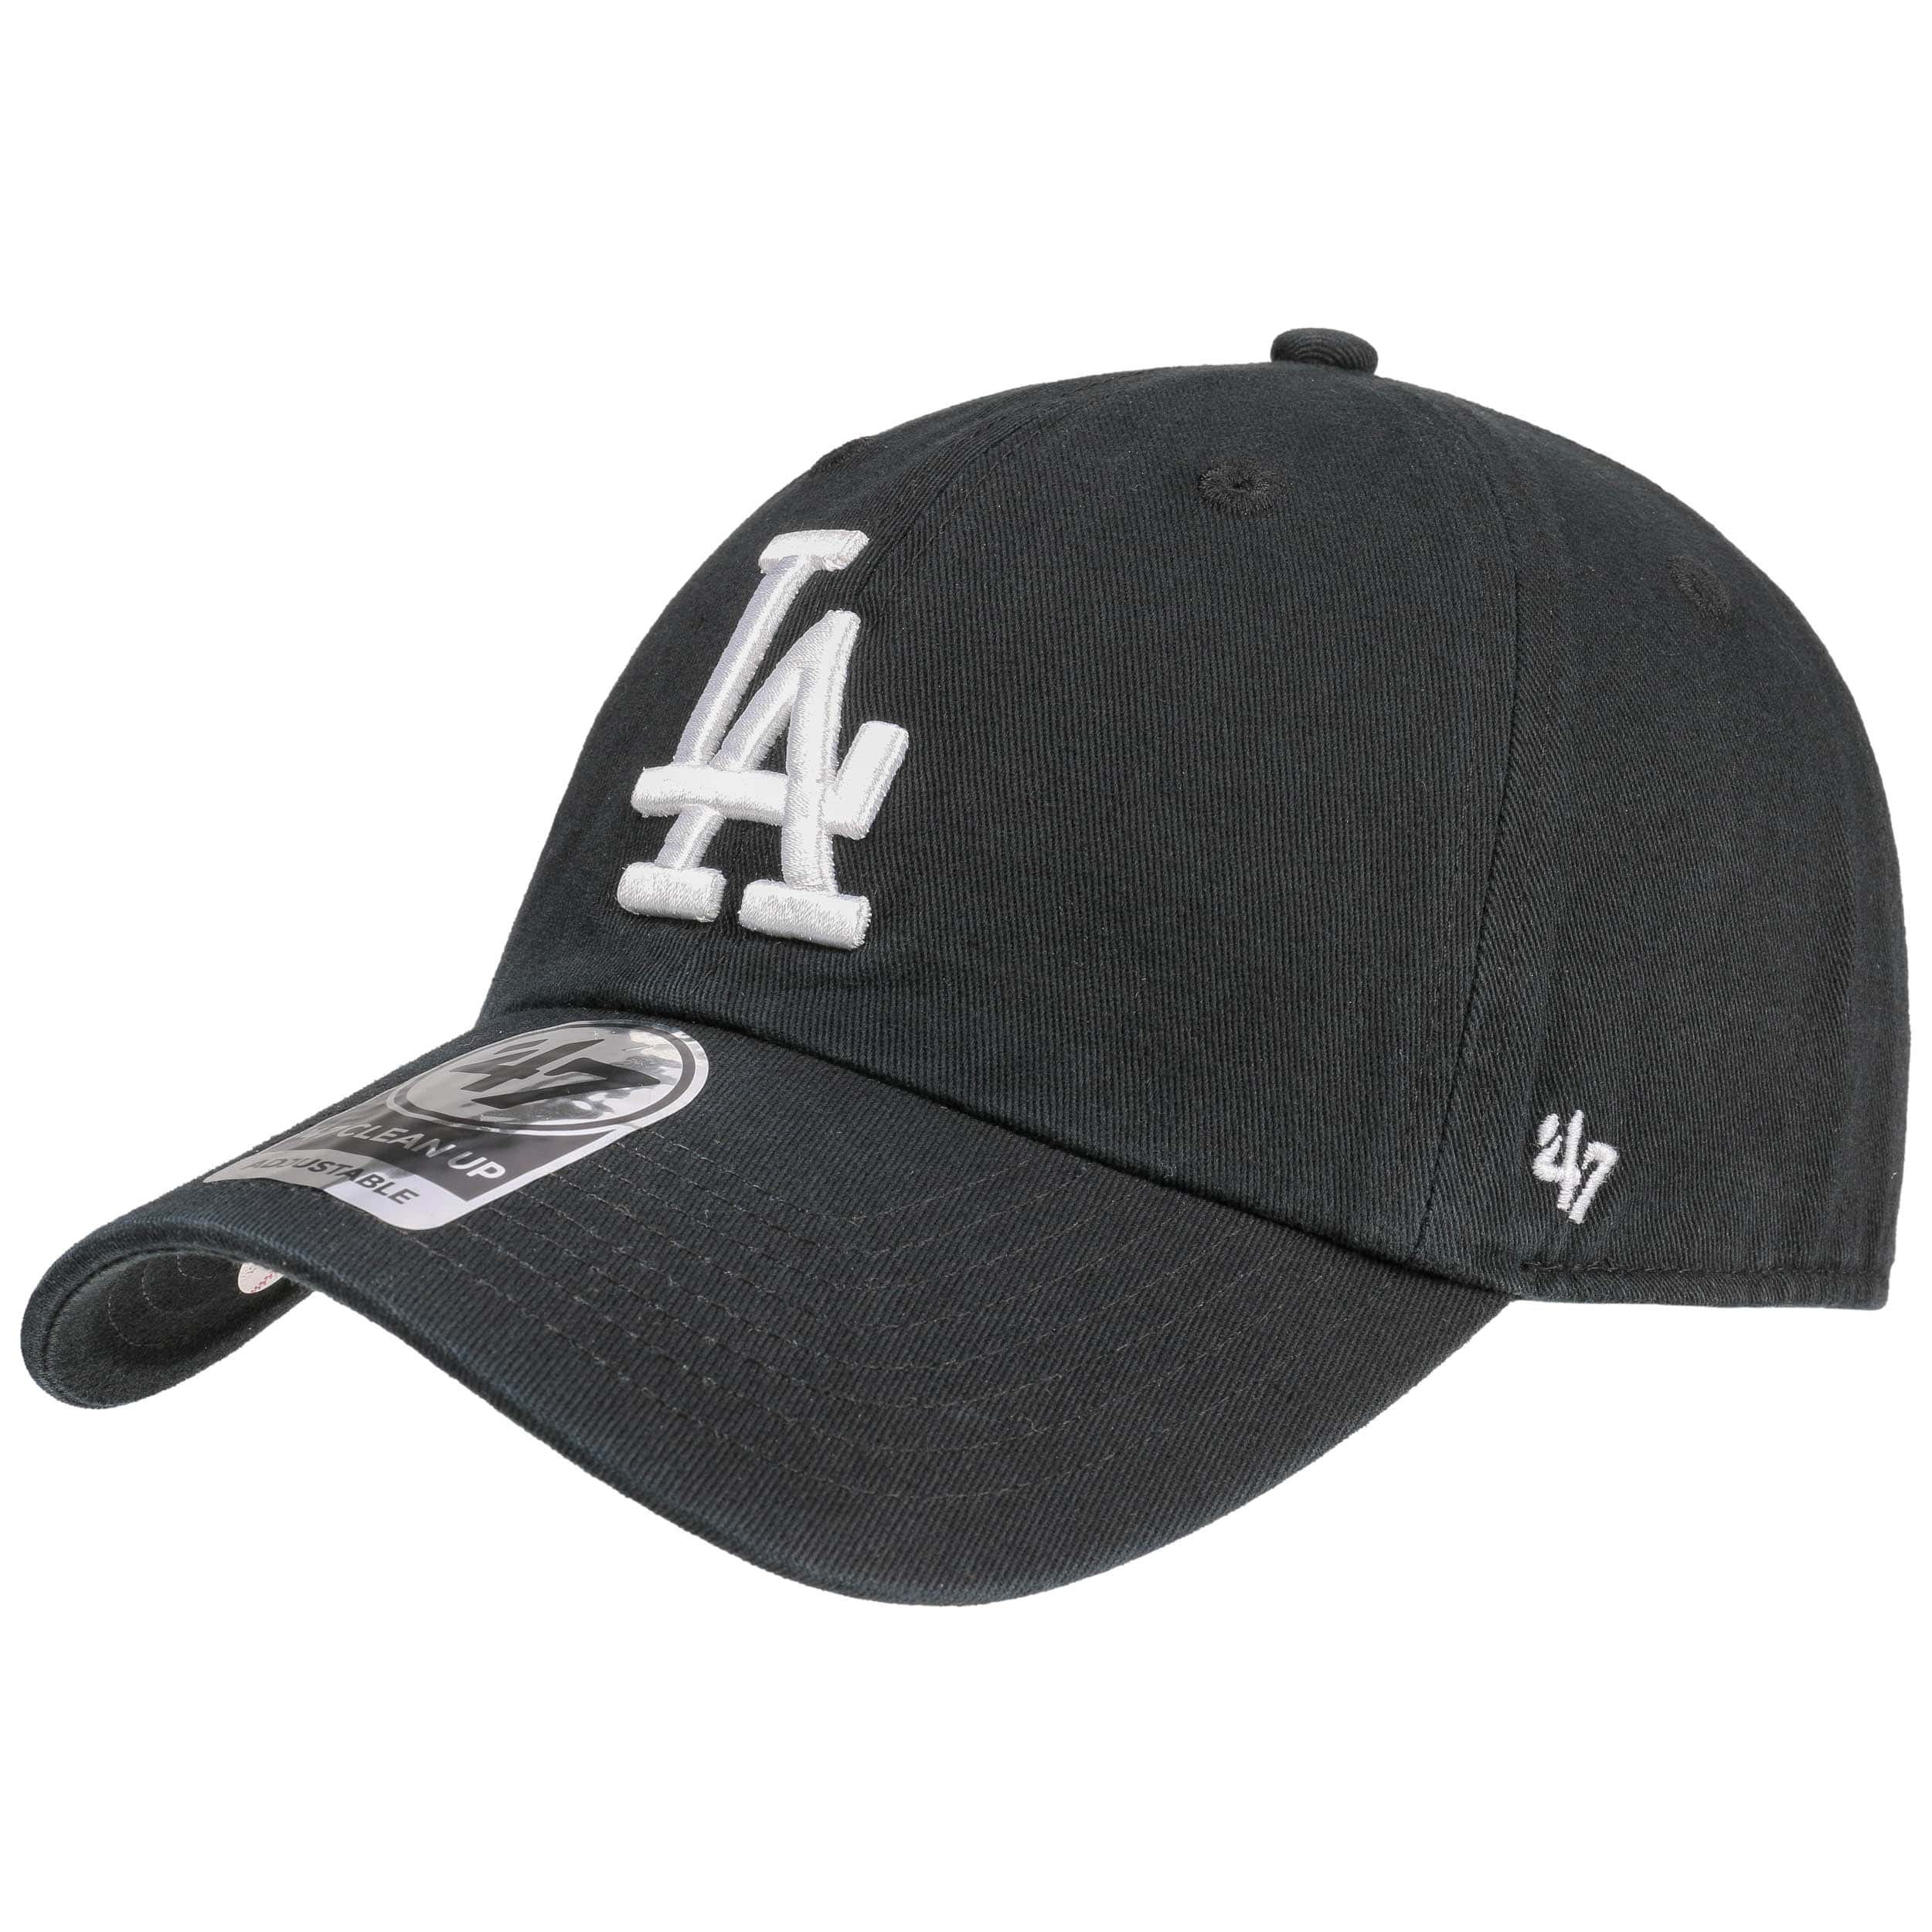 faf4012b32dbb Clean Up LA Dodgers Cap. by 47 Brand